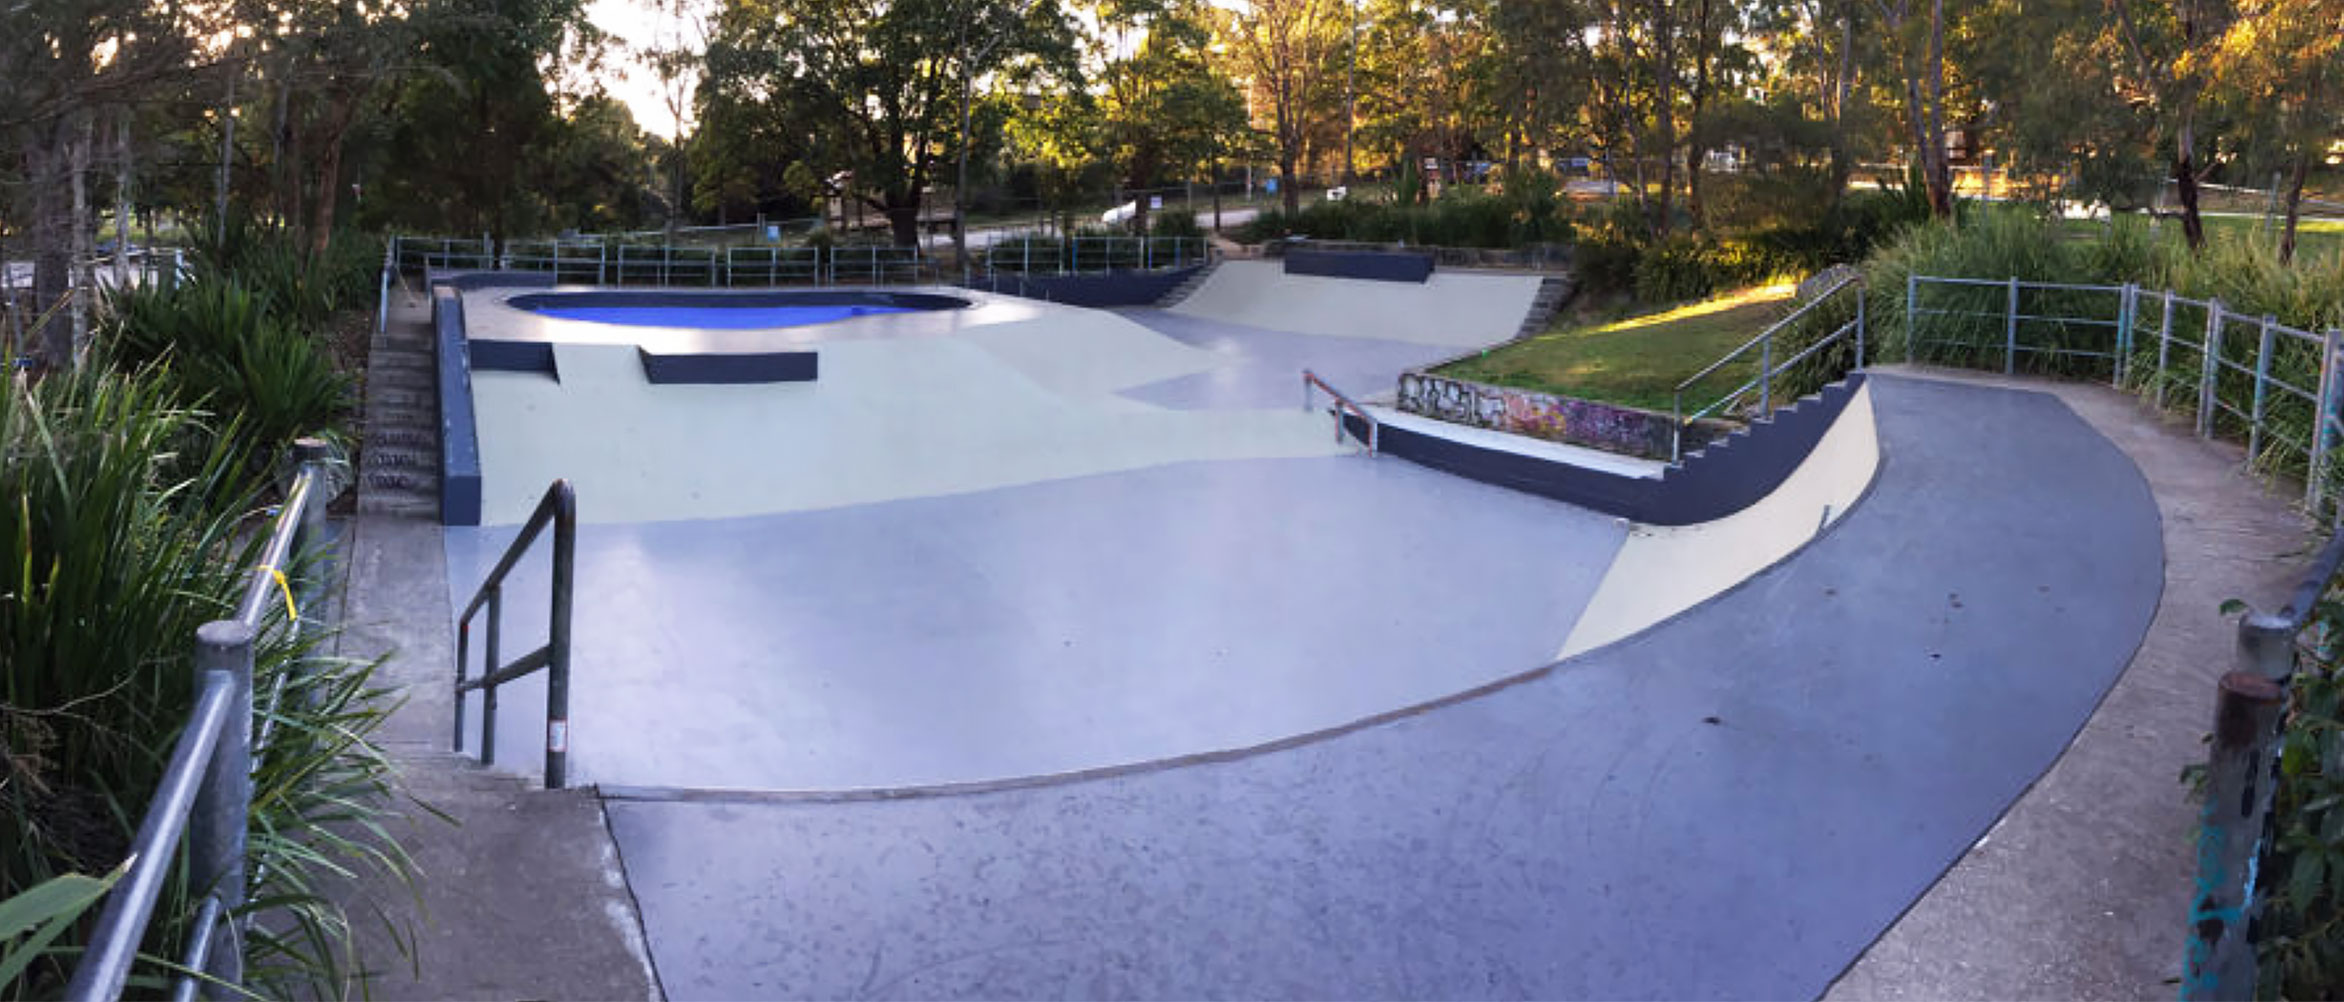 Manly Vale skate park sydney, concrete skateparks